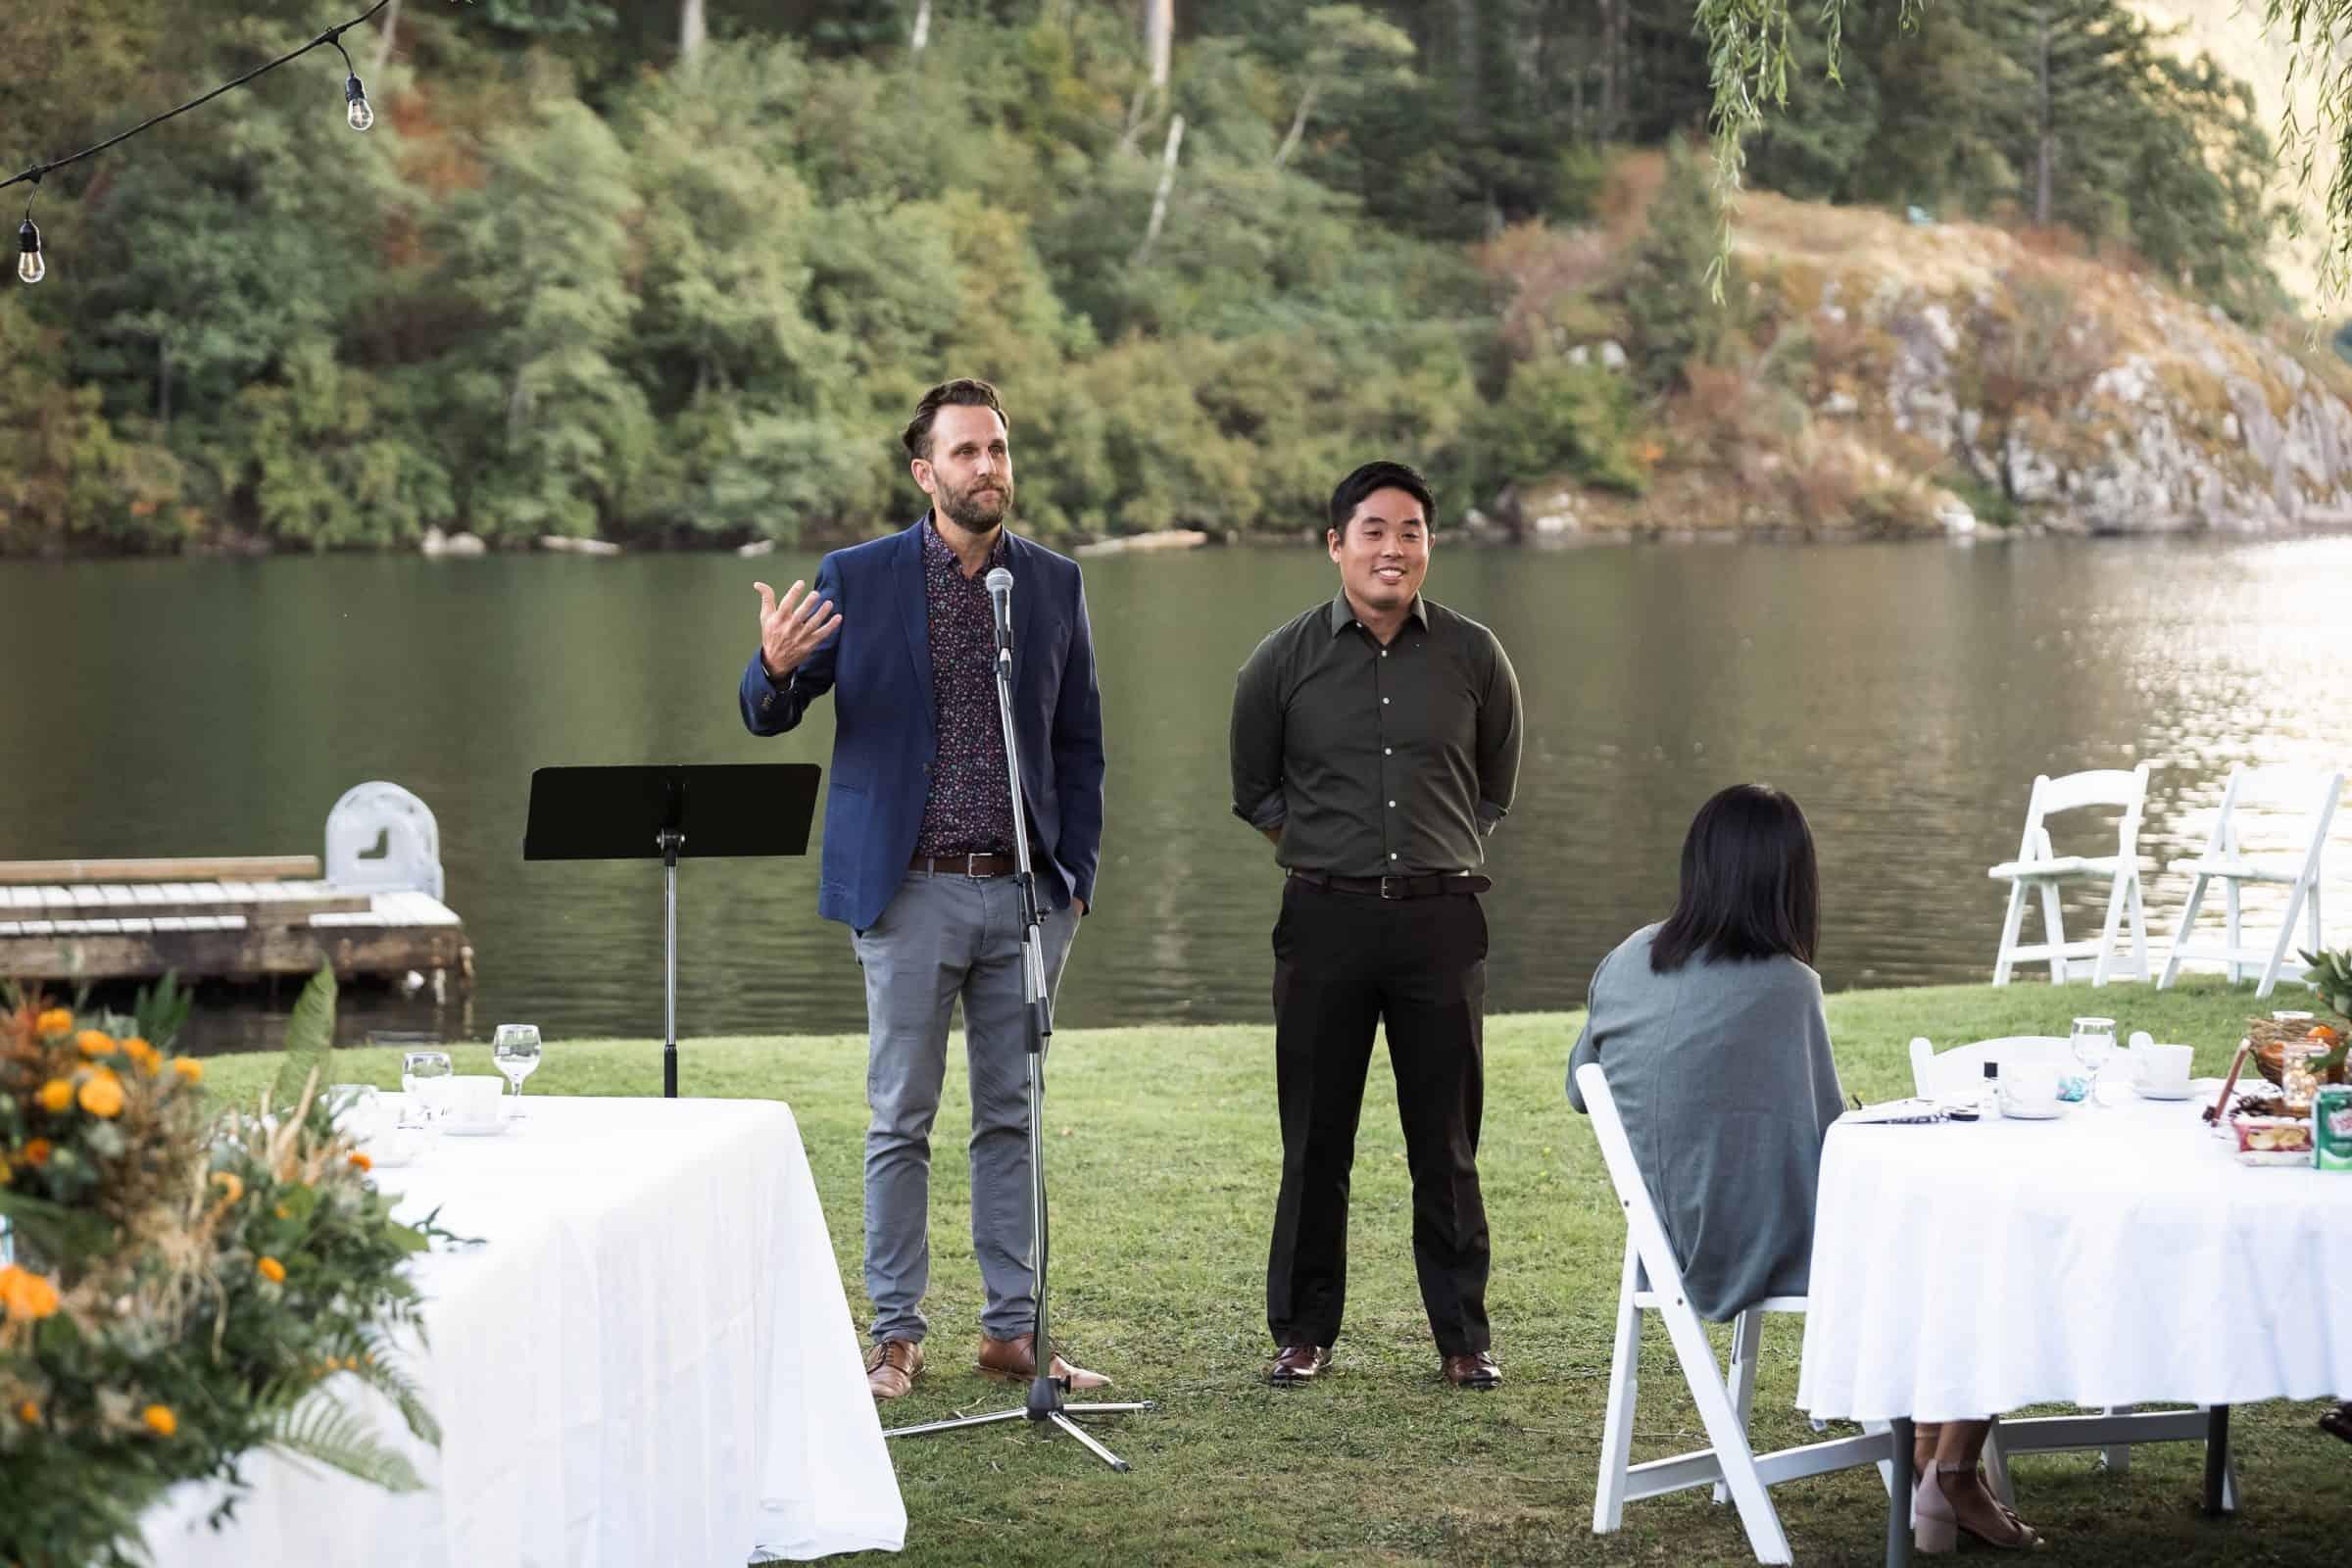 two men standing up to MC a backyard wedding